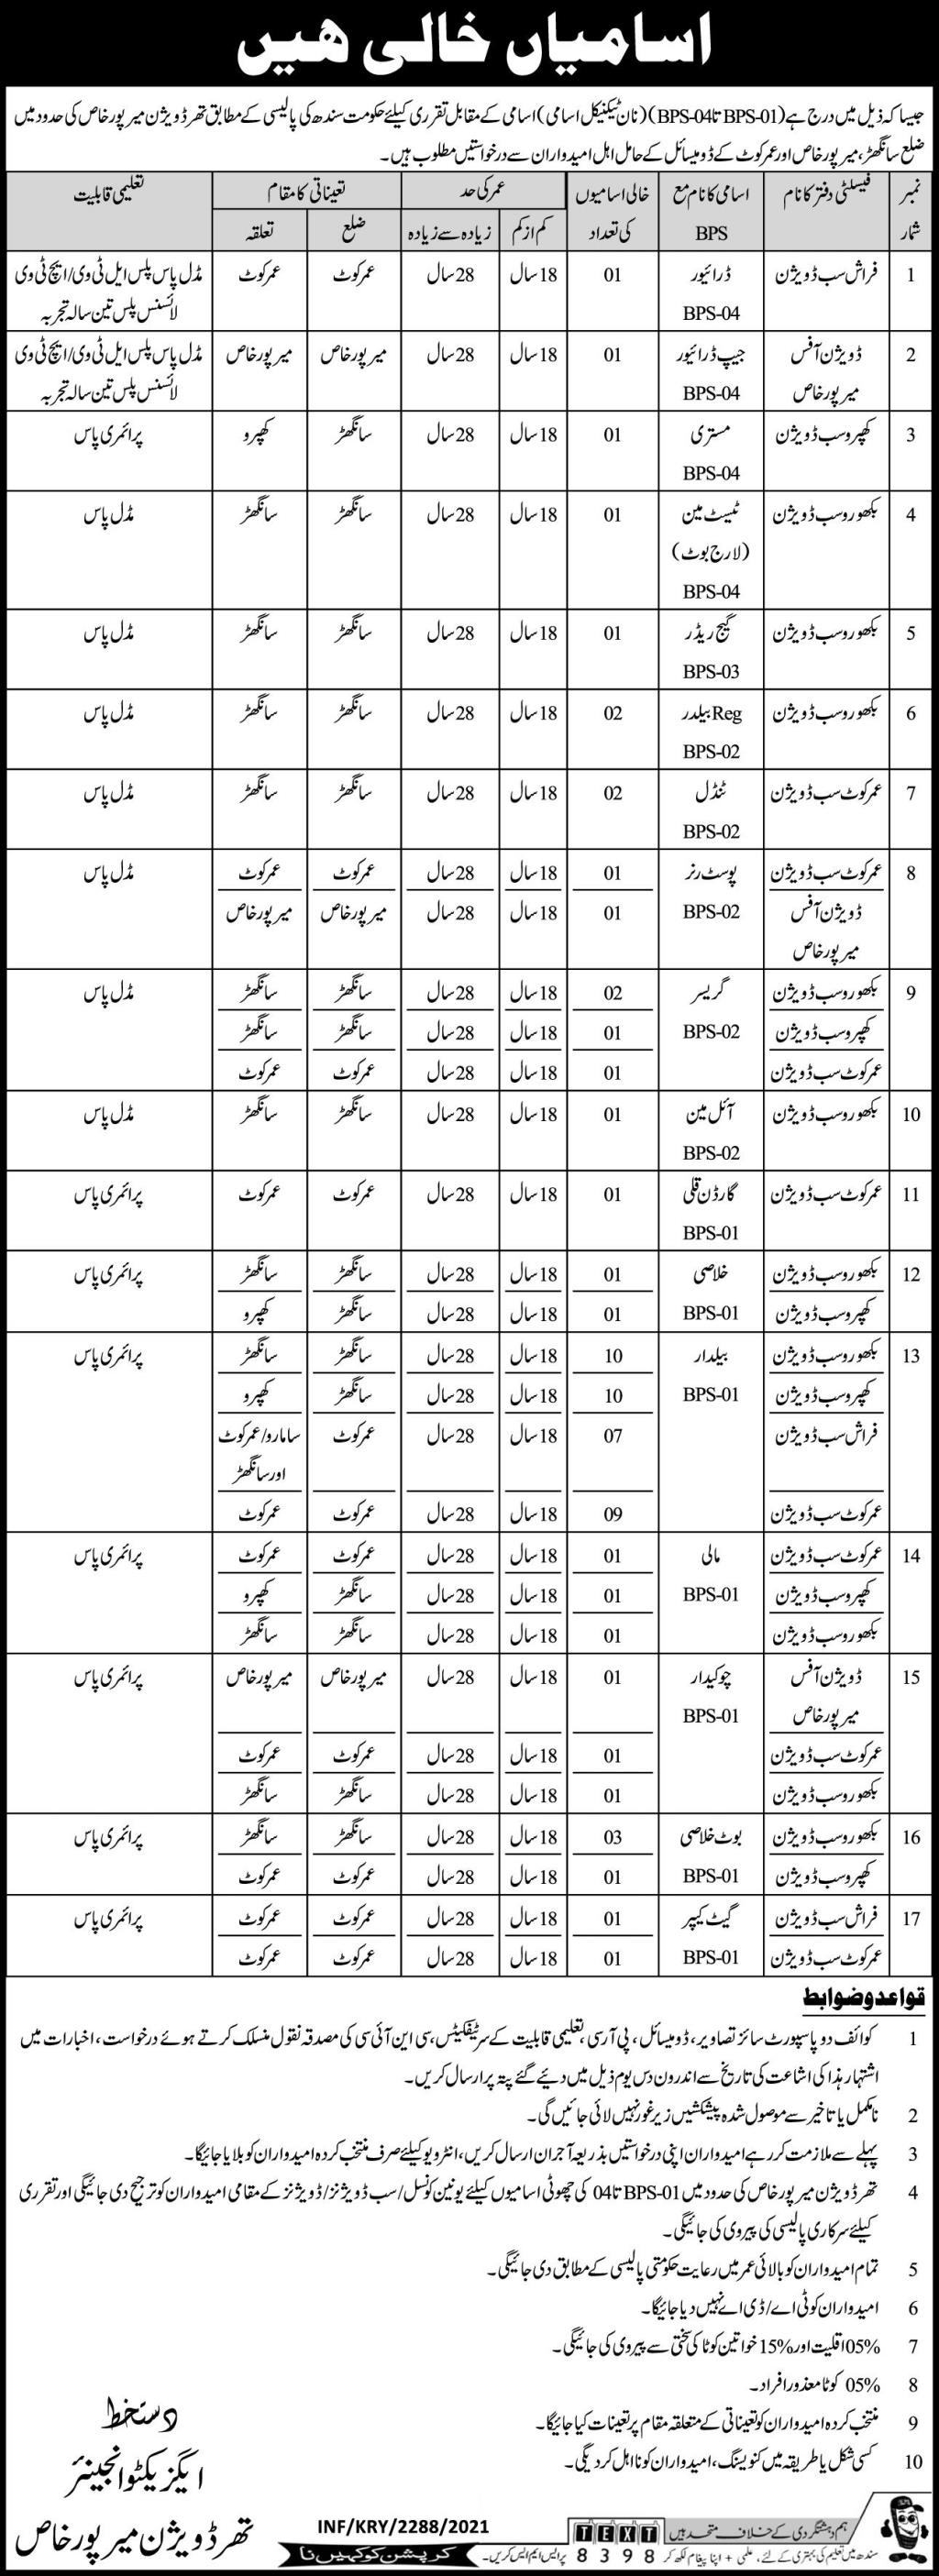 Executive Engineer Office Thar Division Mirpurkhas Jobs 2021 in Pakistan